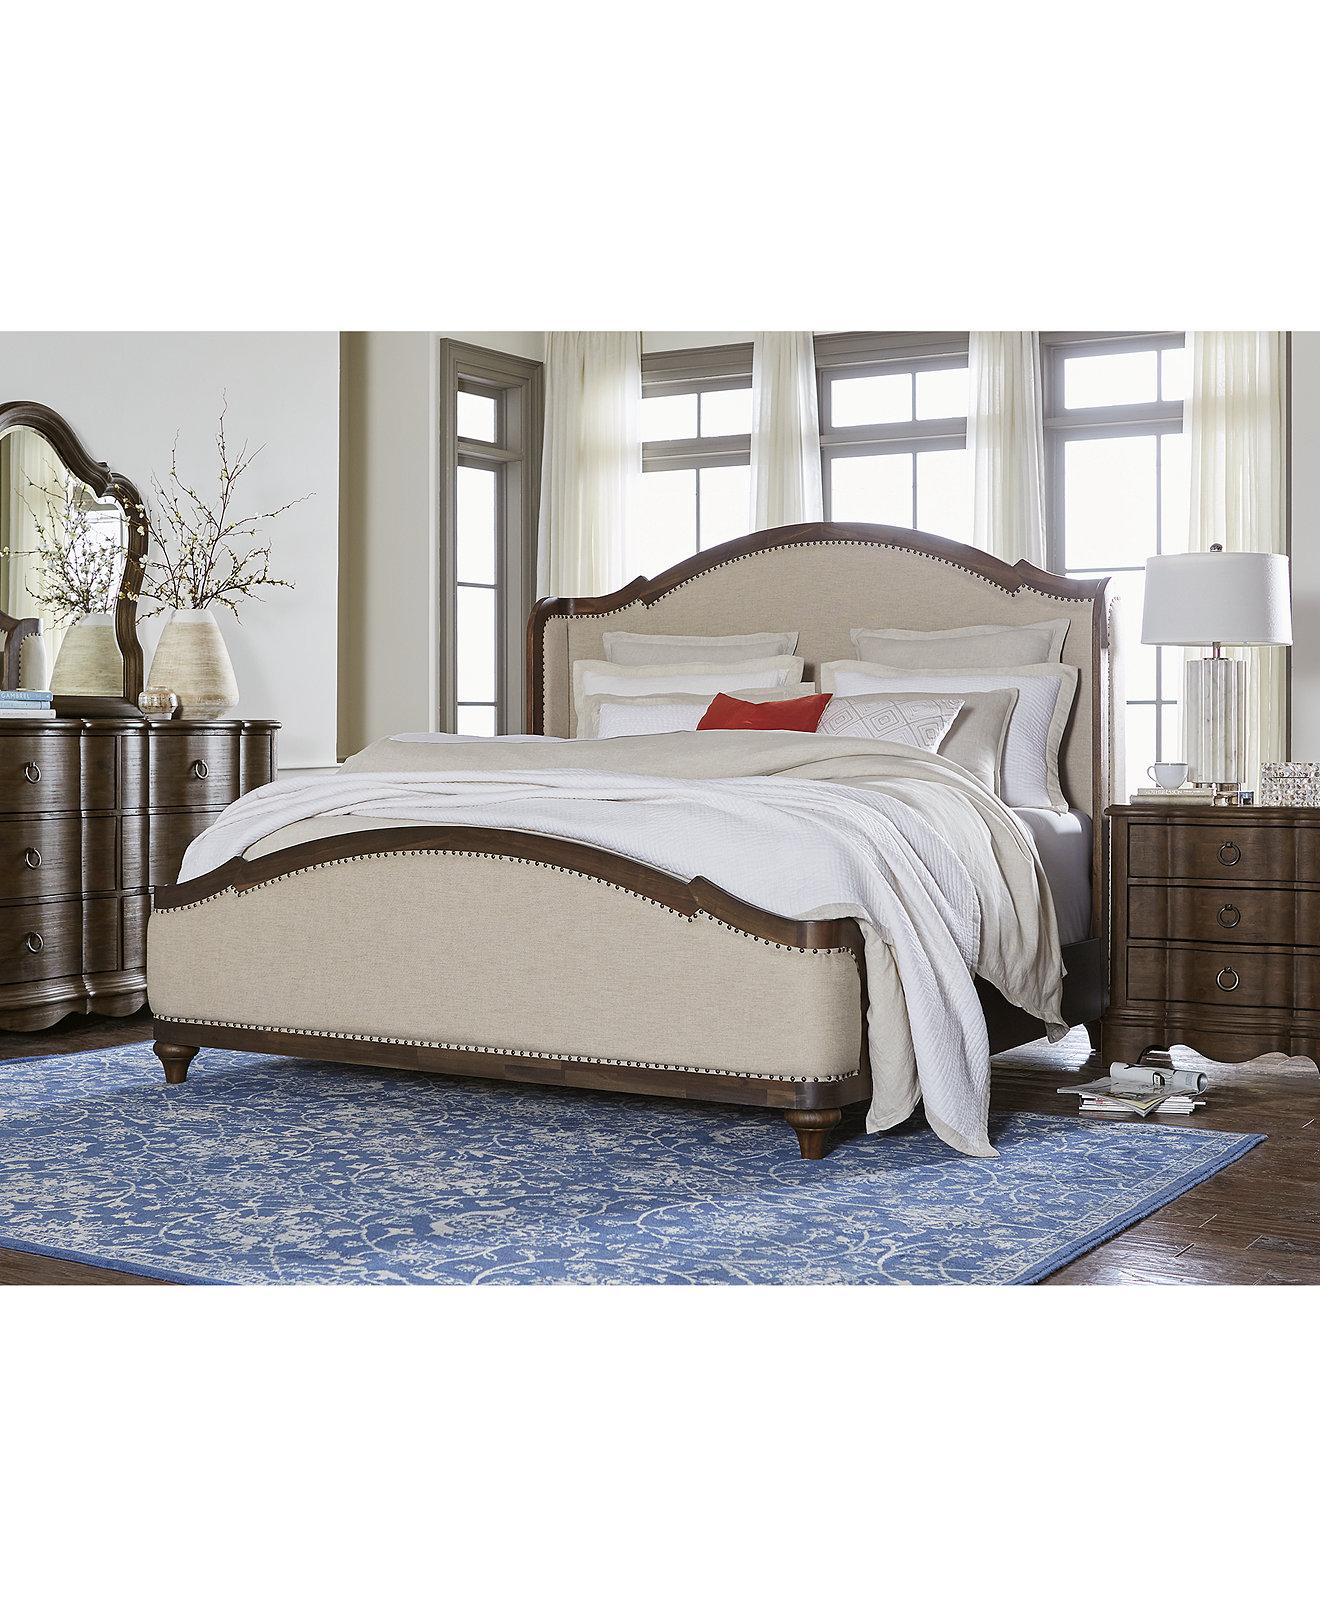 Bedroom Furniture Sets - Macy's